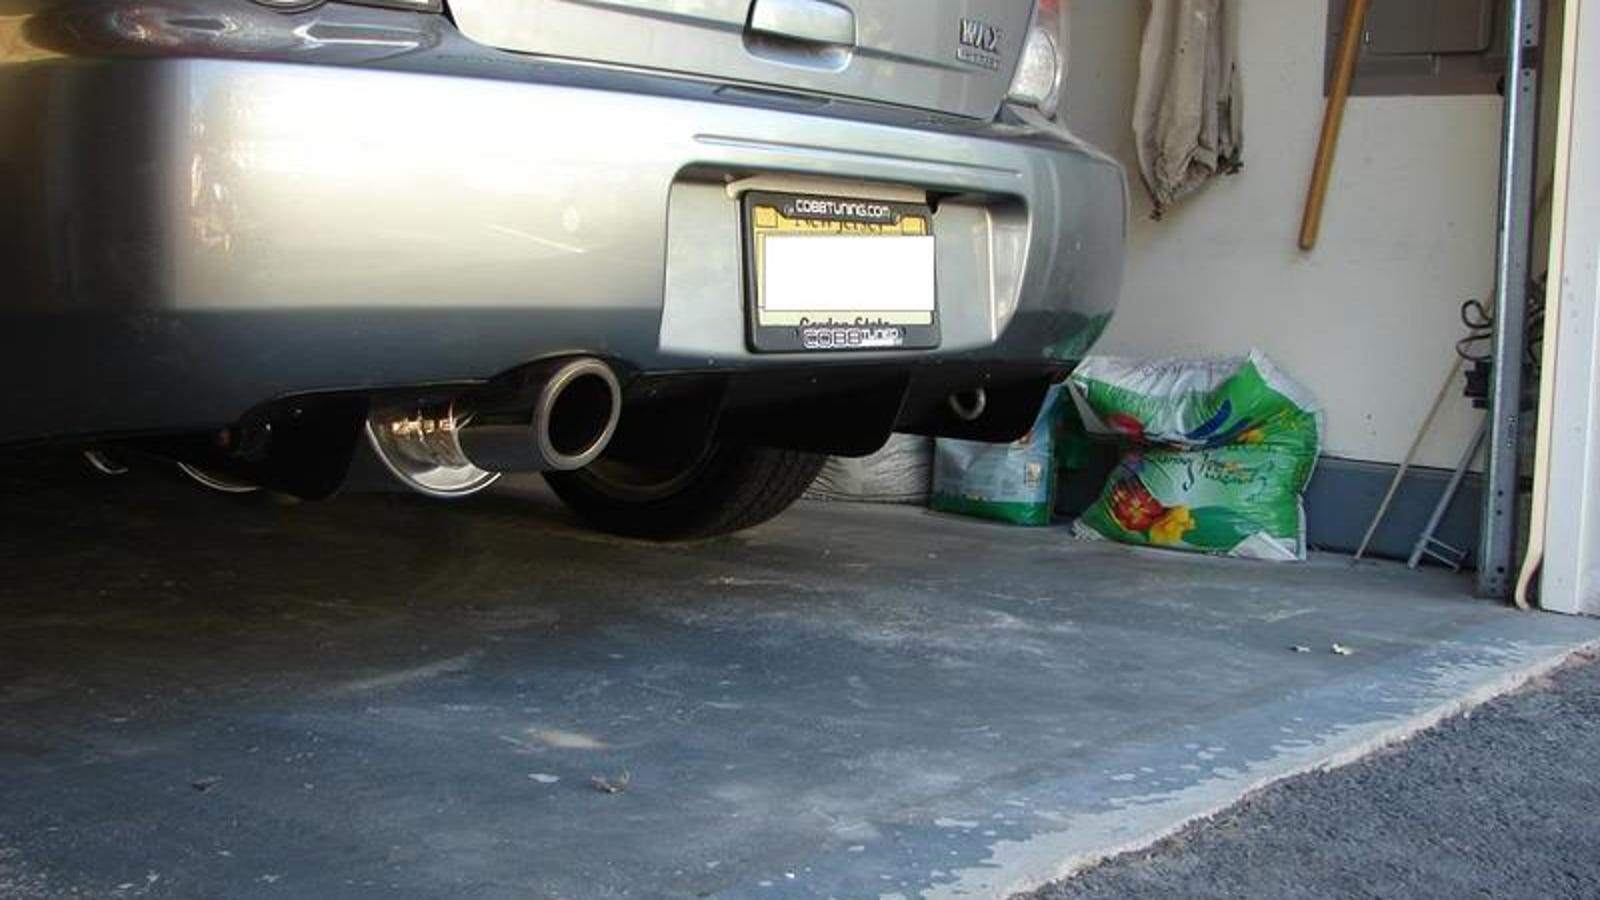 Awesome DIY rear diffuser